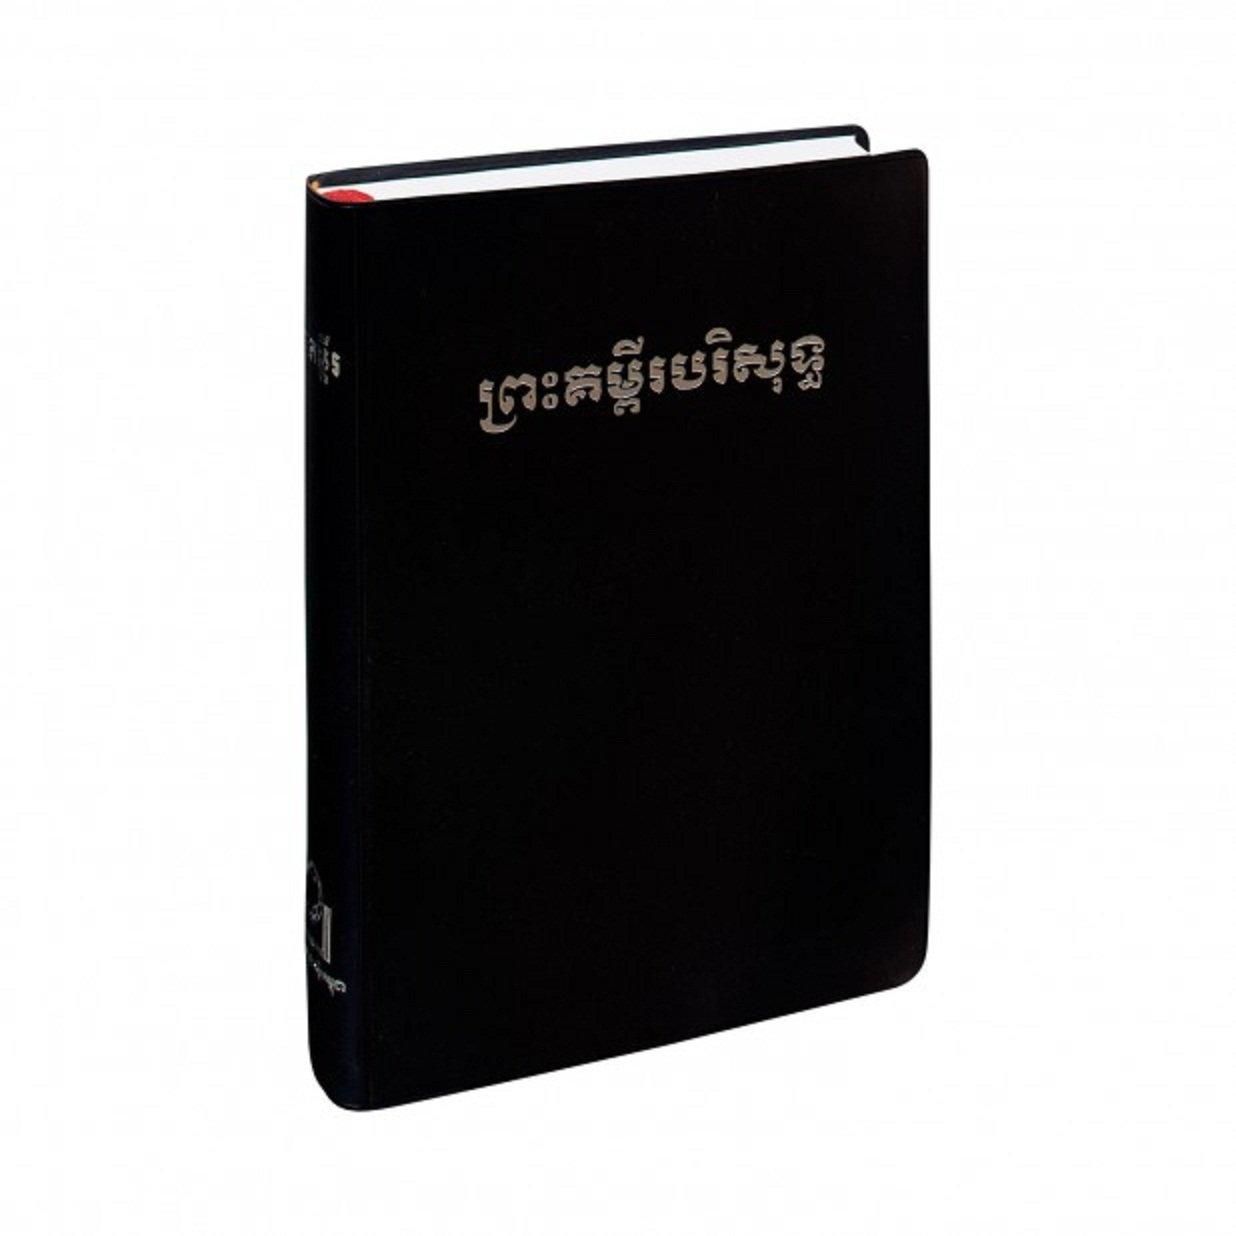 Cambodian Khmer Bible Hc Khov63Vl ebook